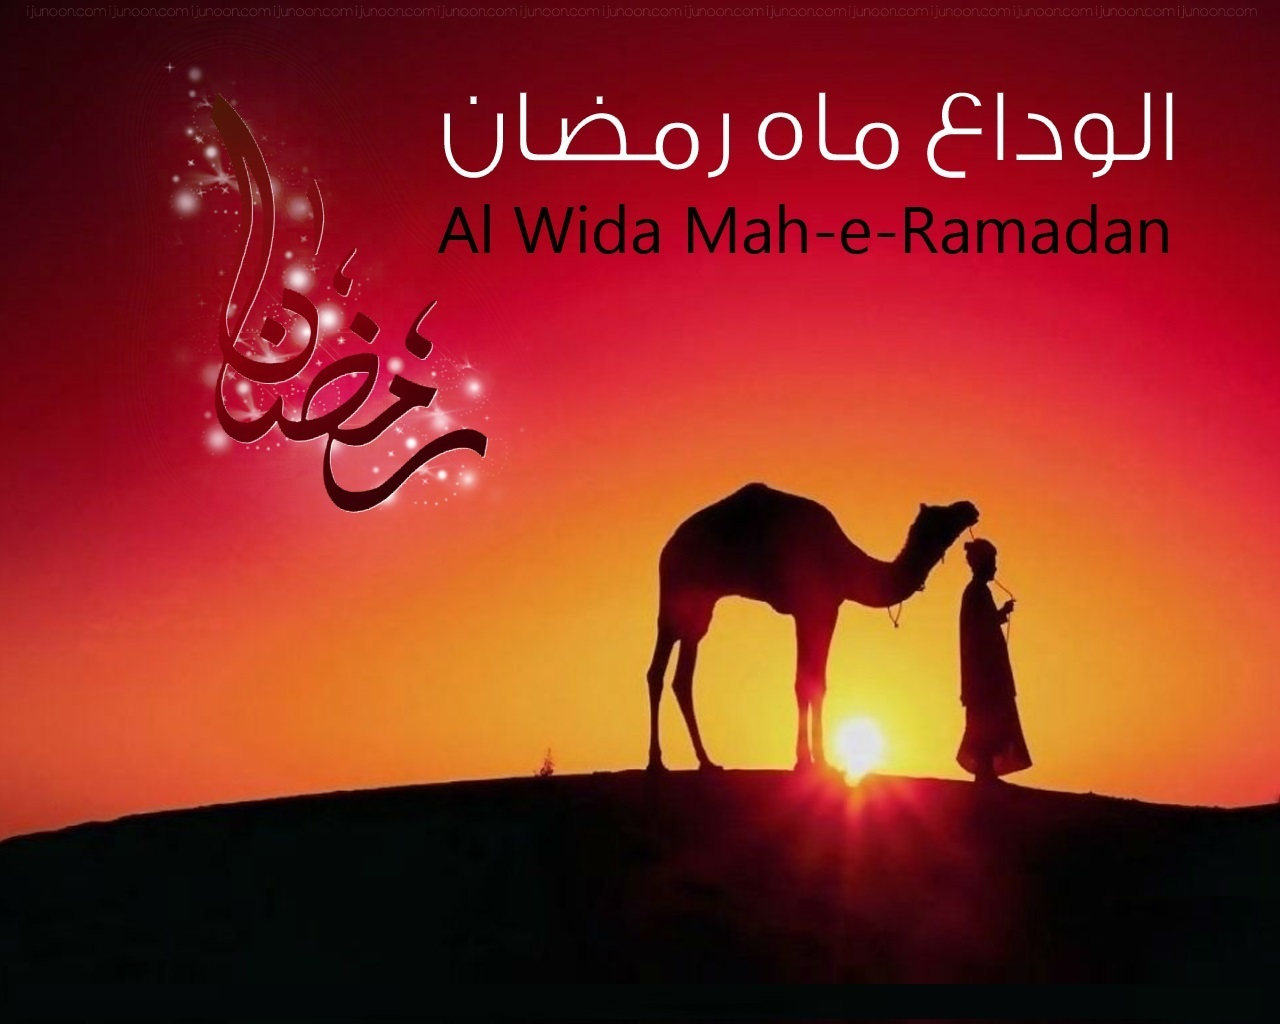 Happy Alvida Mahe Ramadan 2019 Wishes Sms Quotes Whatsapp Status Dp Images Pics